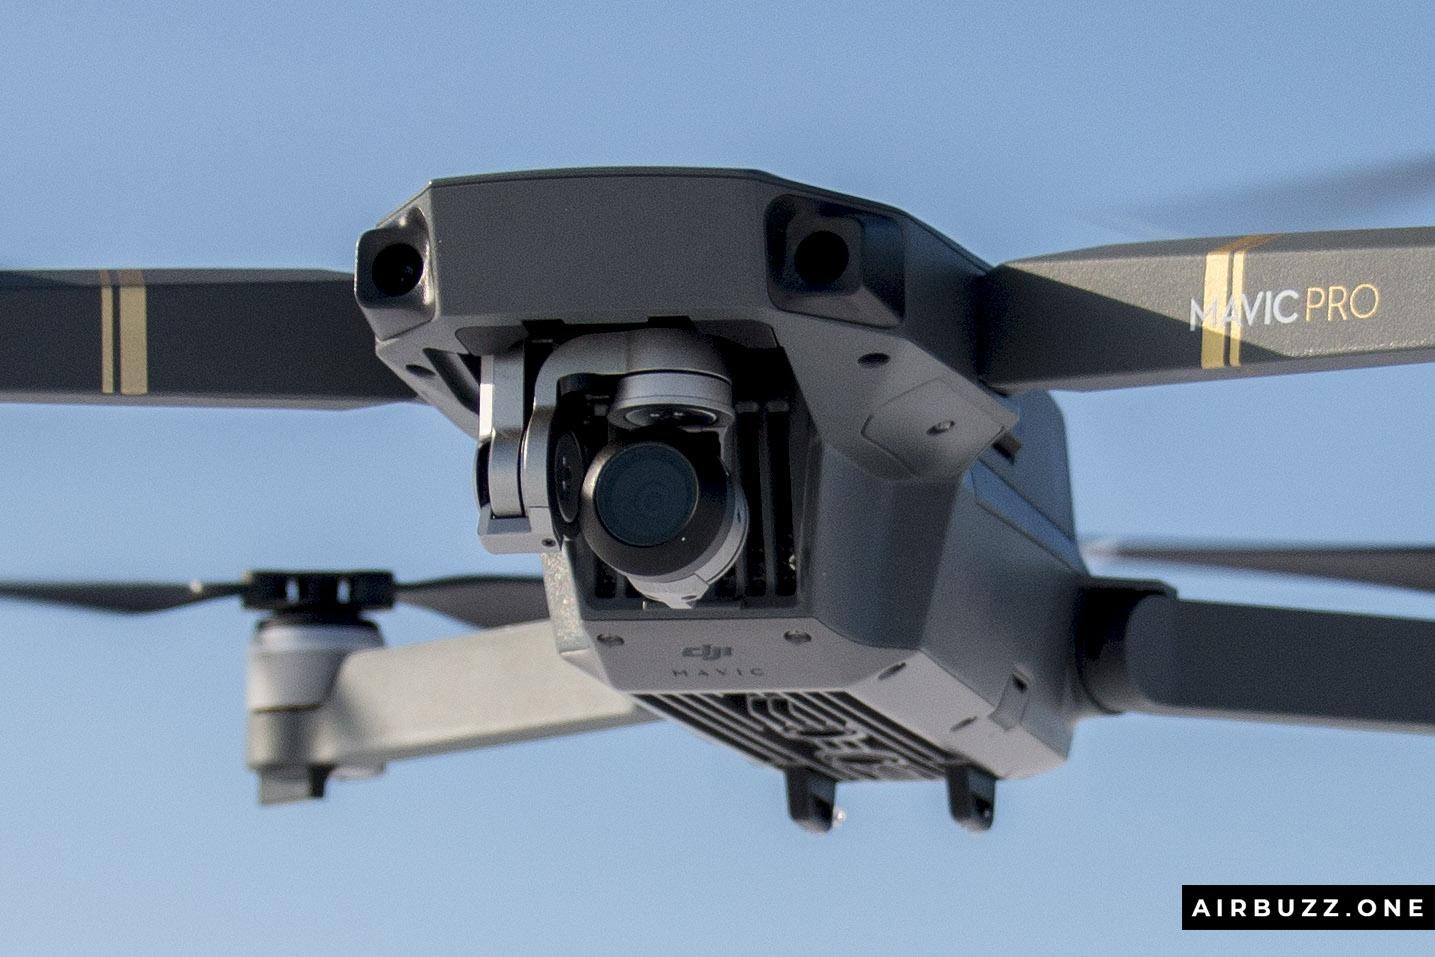 My DJI Mavic Pro camera drone